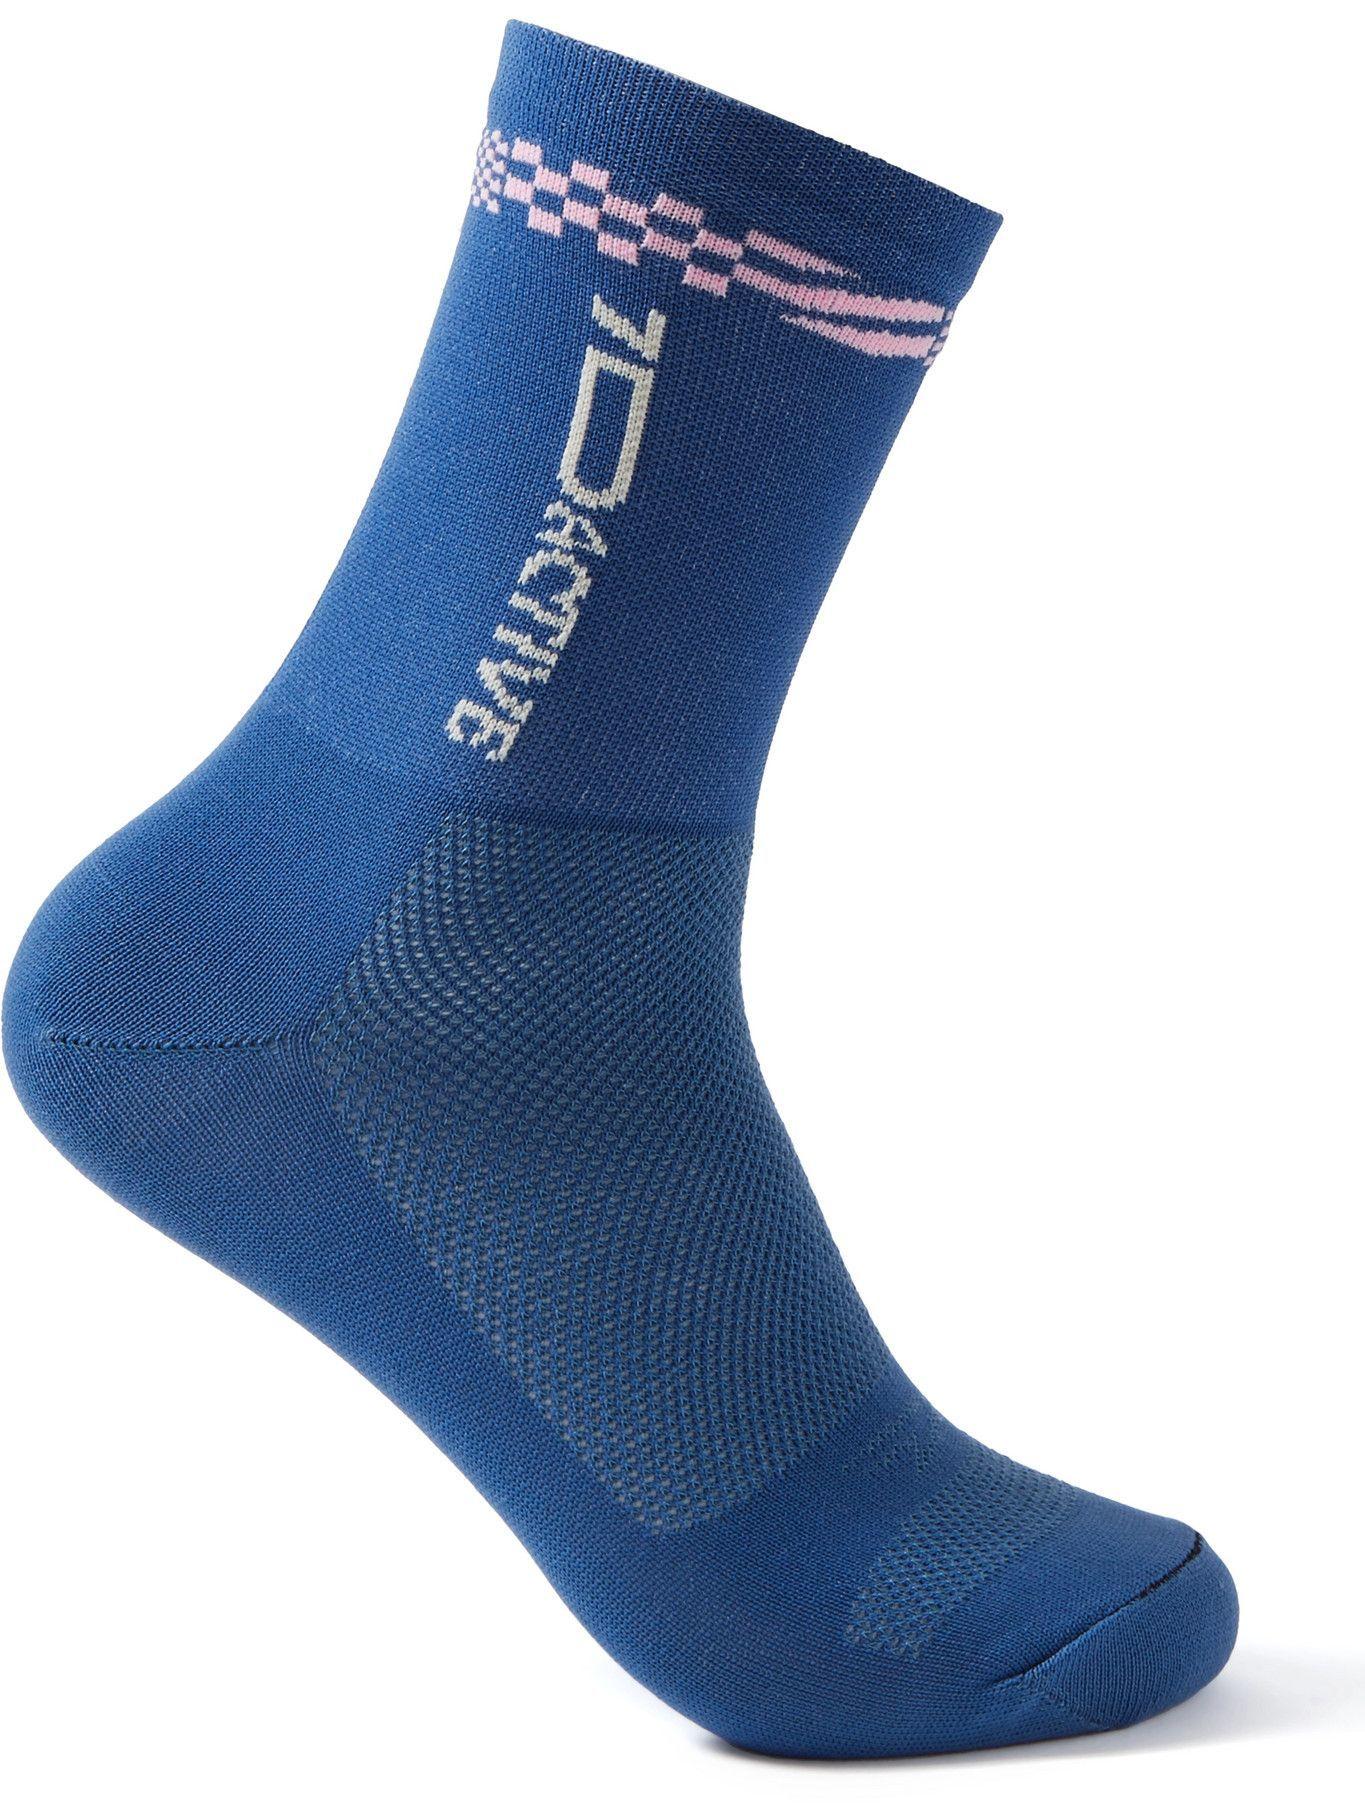 Photo: 7 DAYS ACTIVE - Argon 18 Stretch-Knit Socks - Blue